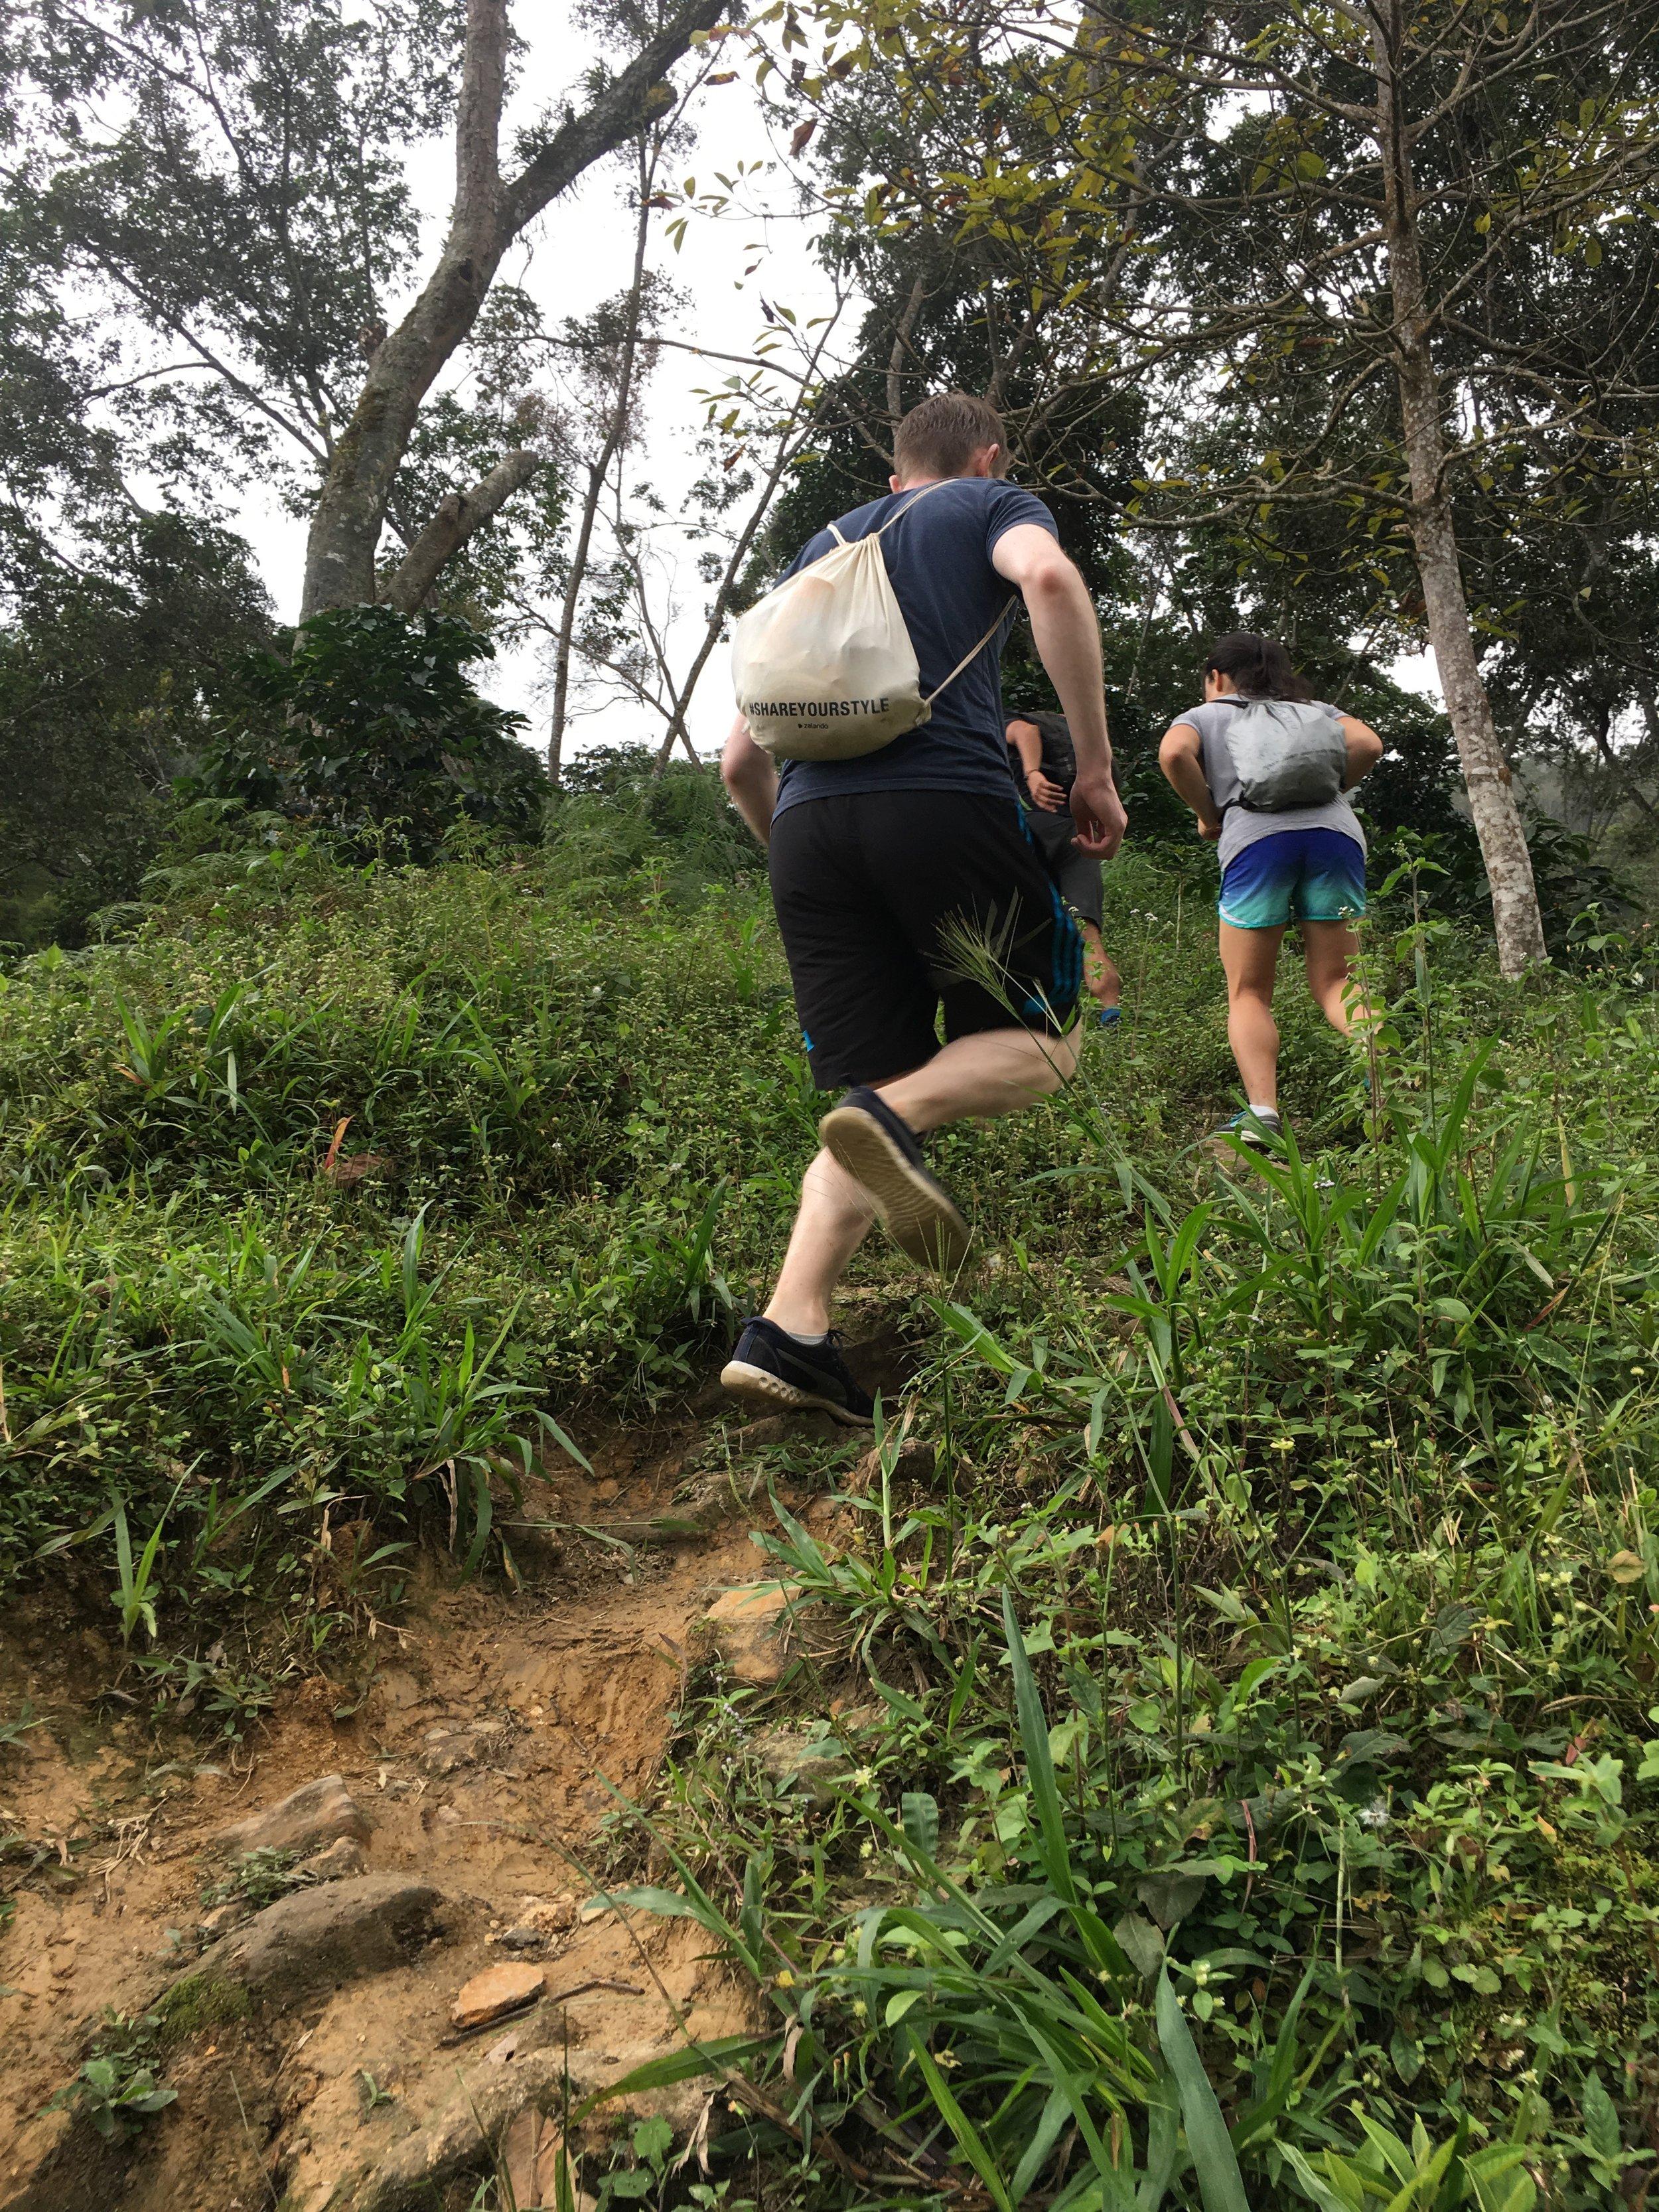 Steep ascension through the plantation